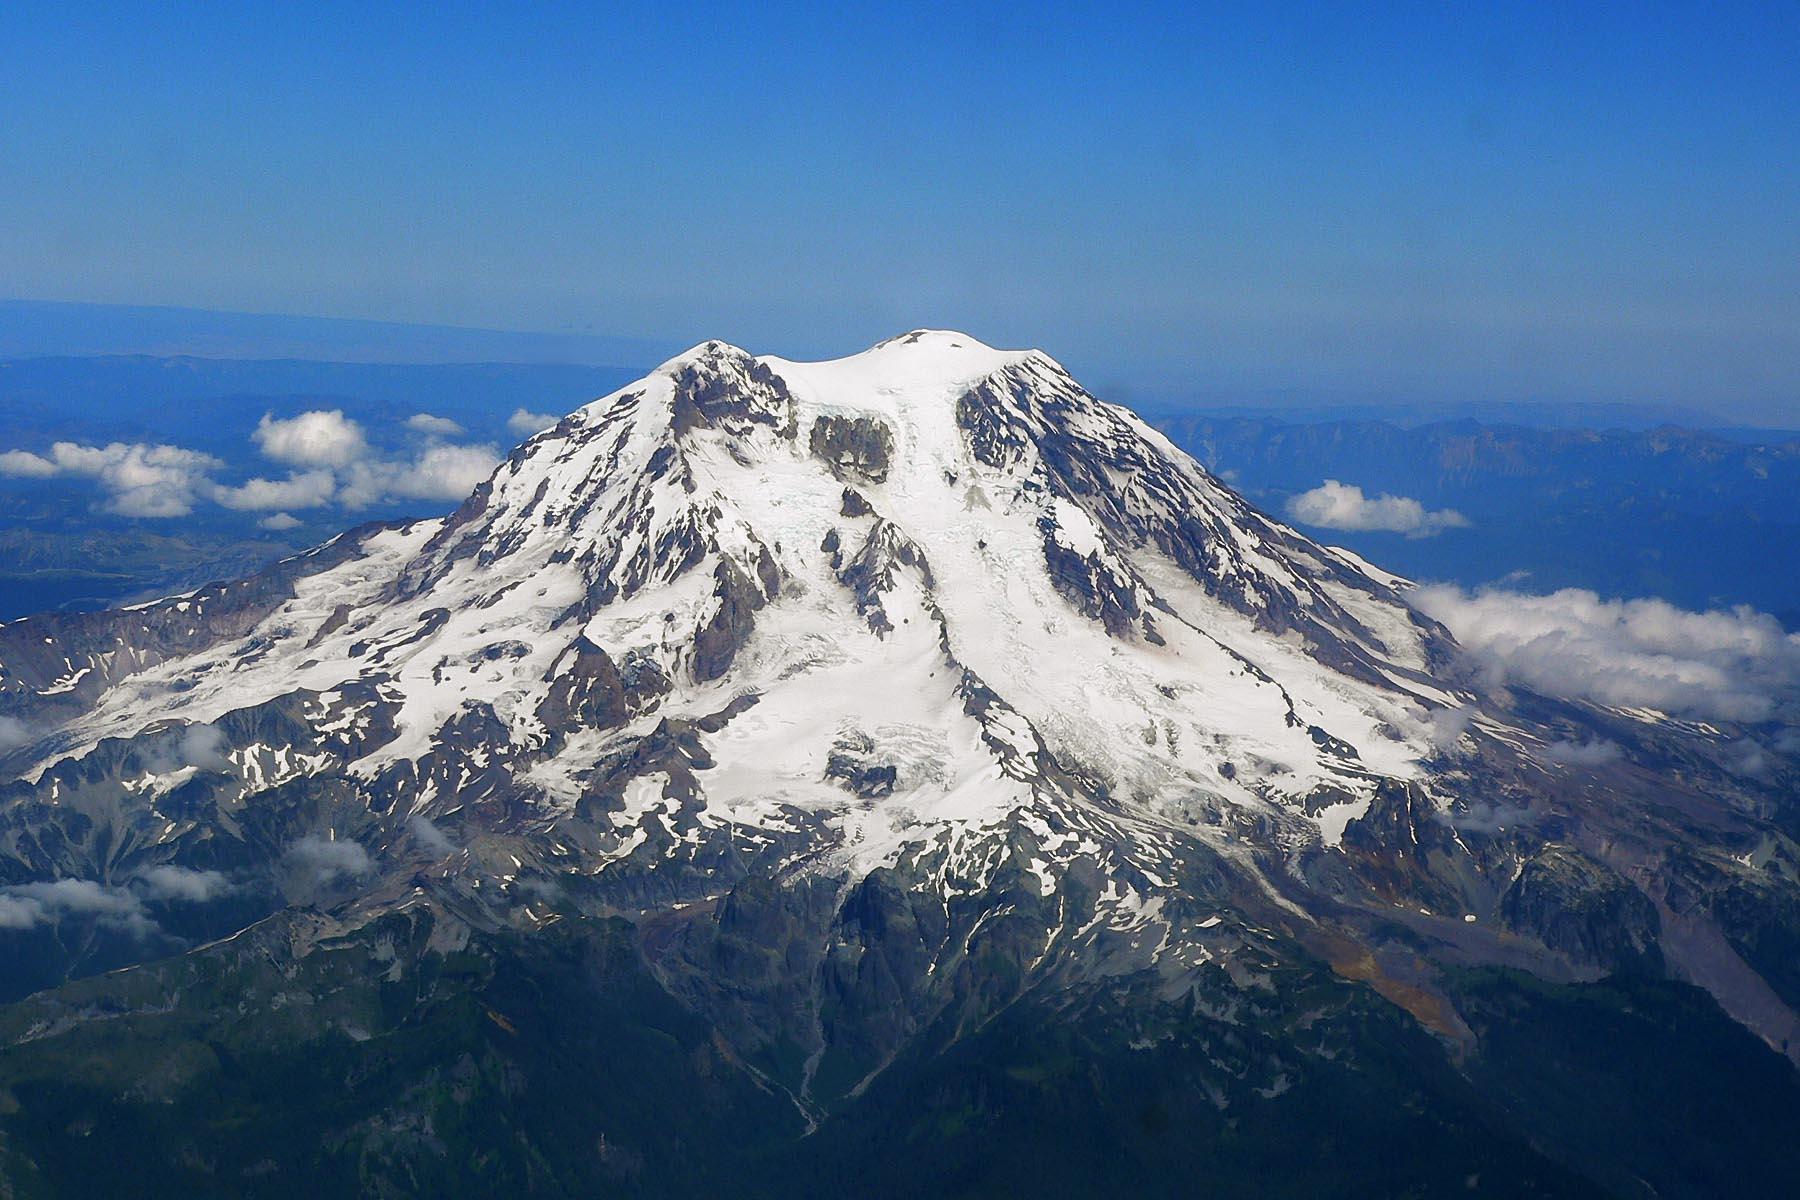 1970: THE UNEXPLAINED: Mount Rainier, Washington - Subterranean Bases